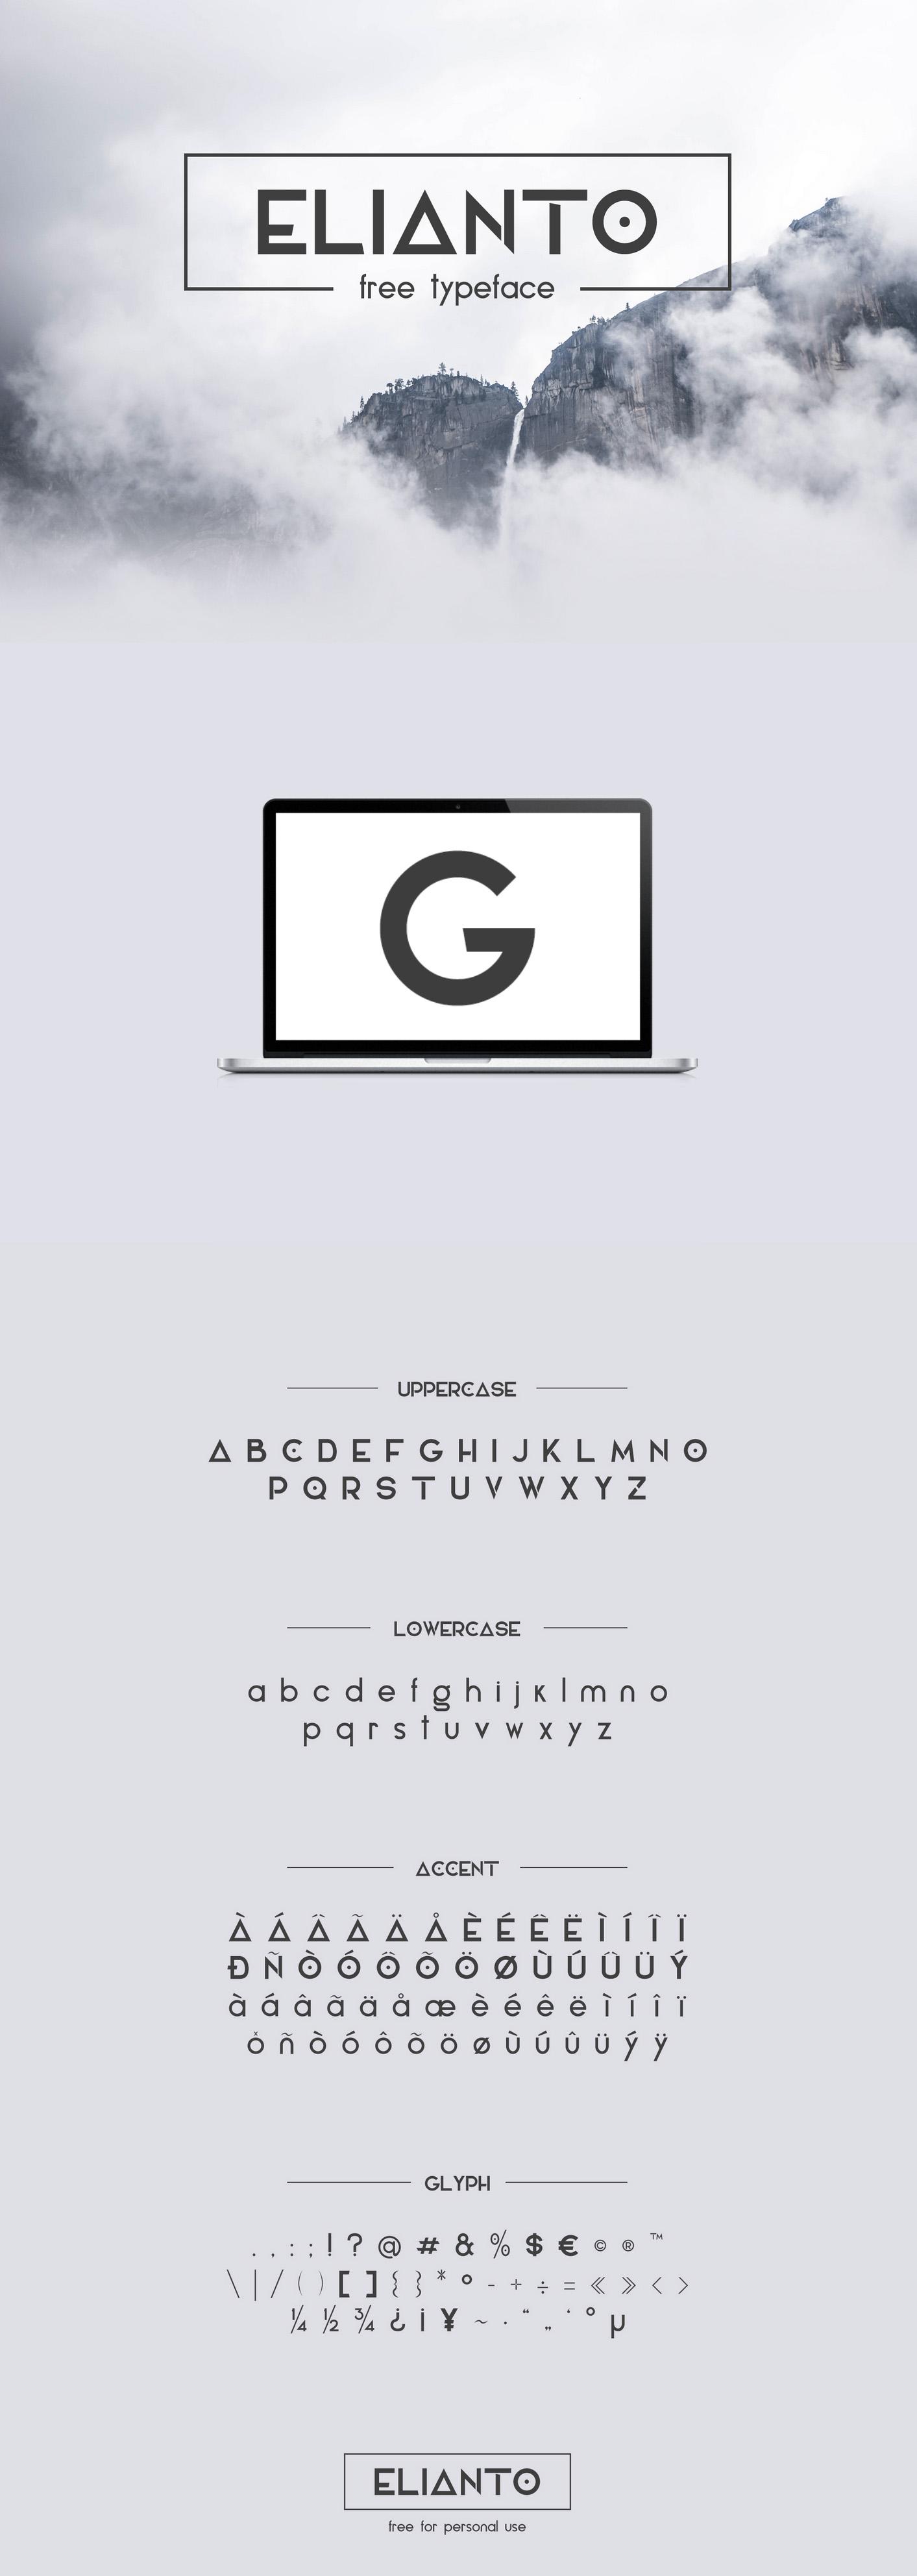 Elianto - Free Font on Behance